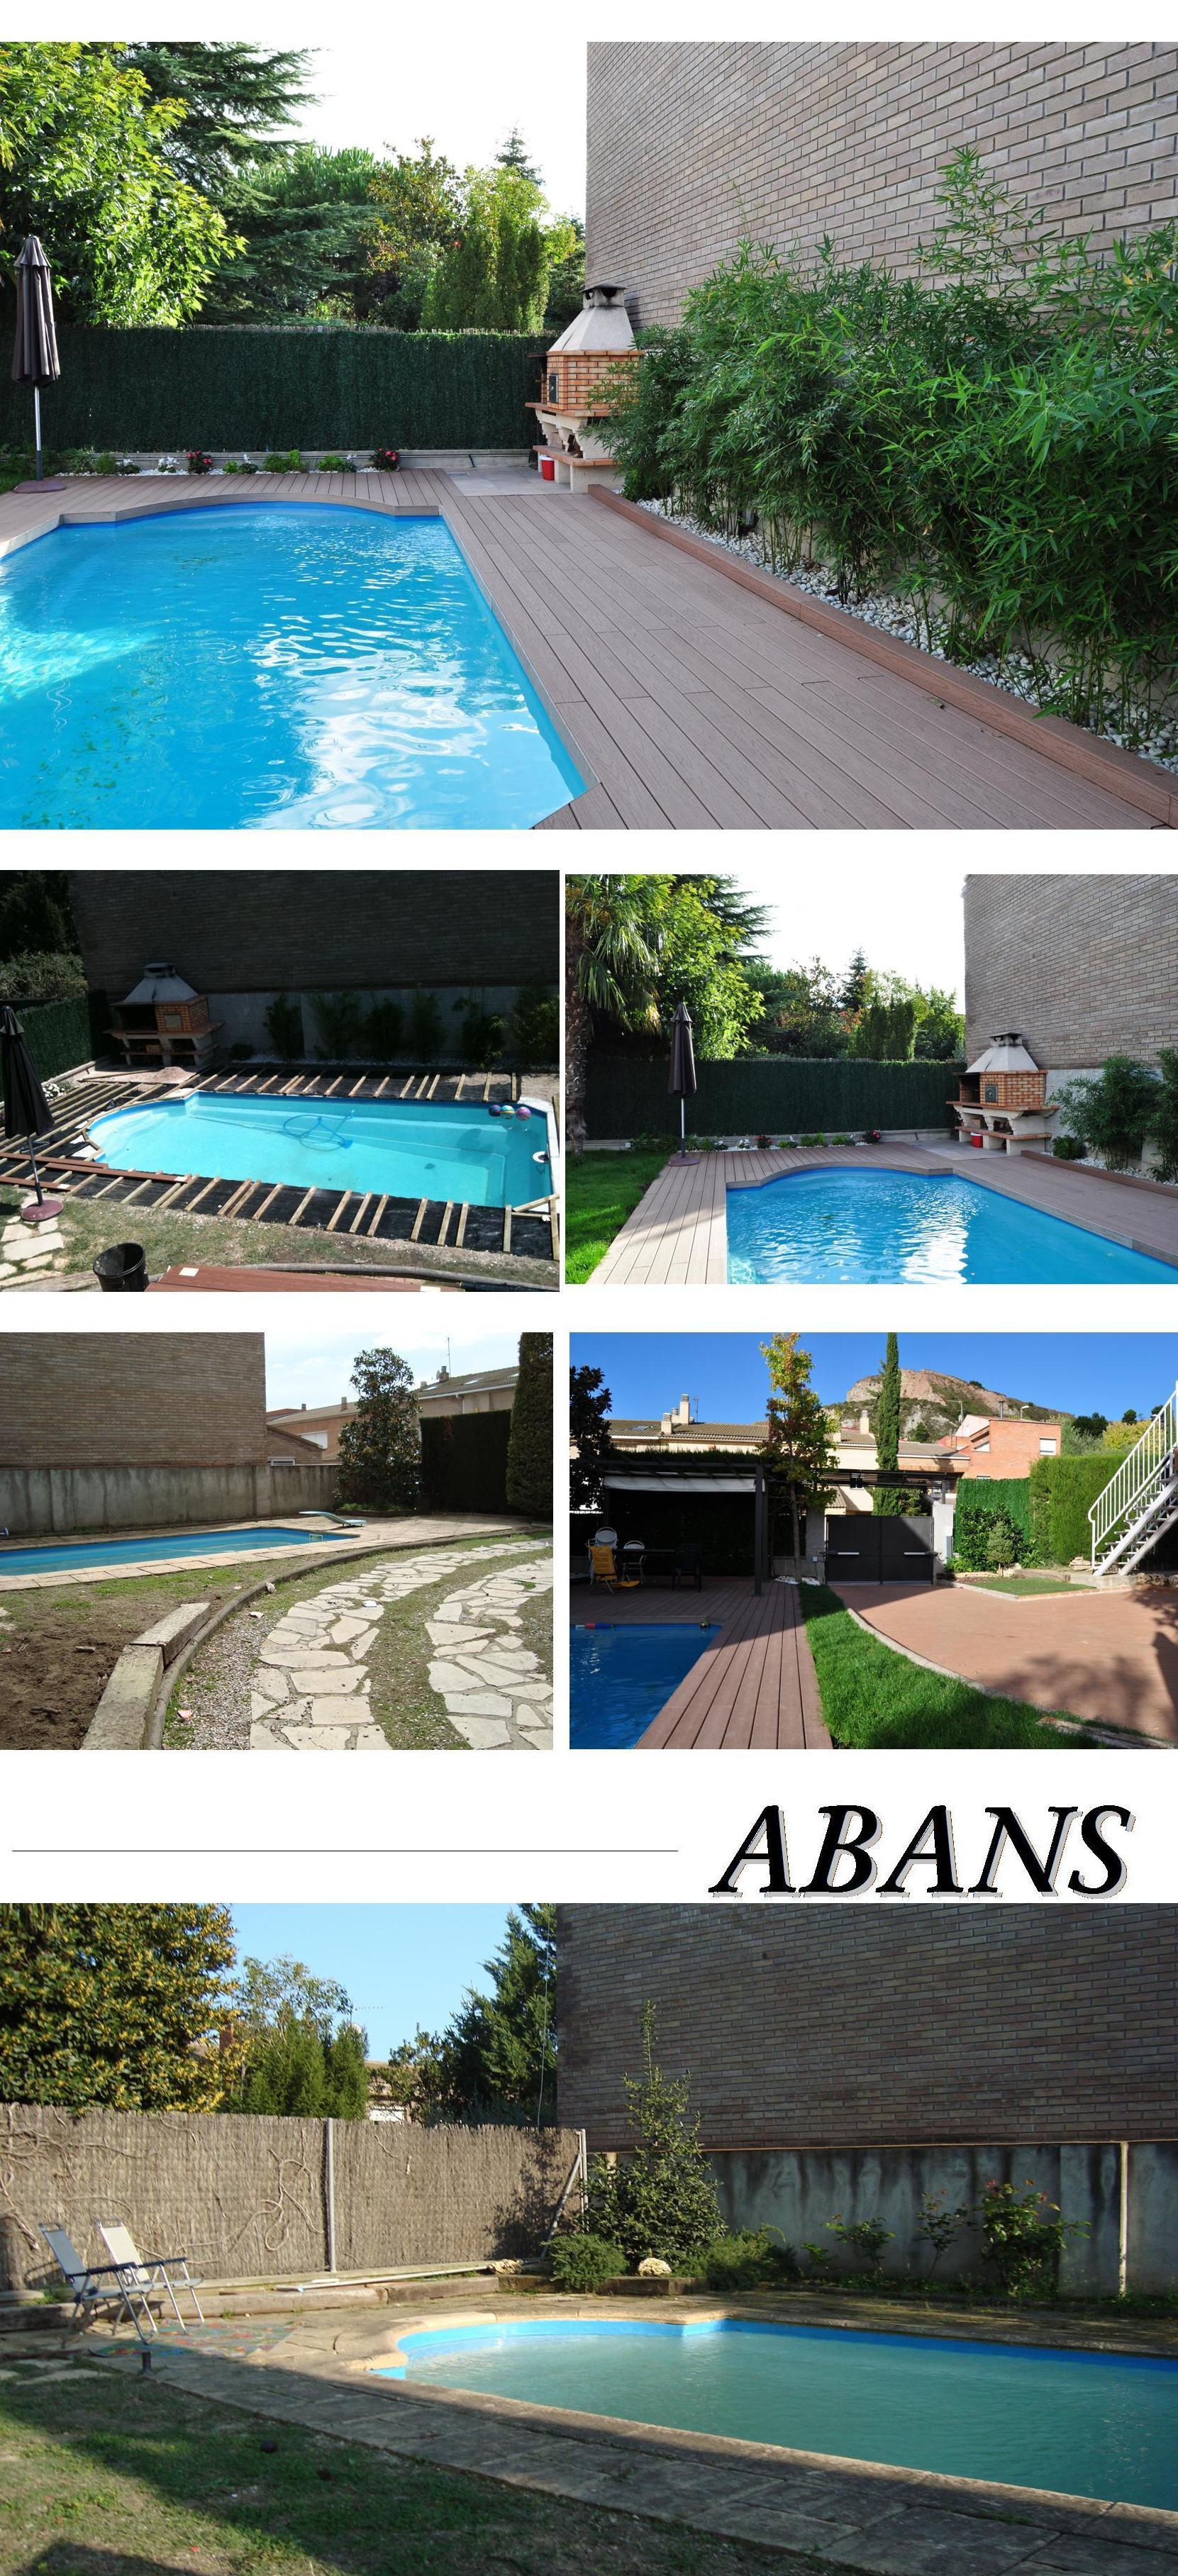 Pavimento piscina madera artificial: Productos  de Gres de l'Anoia